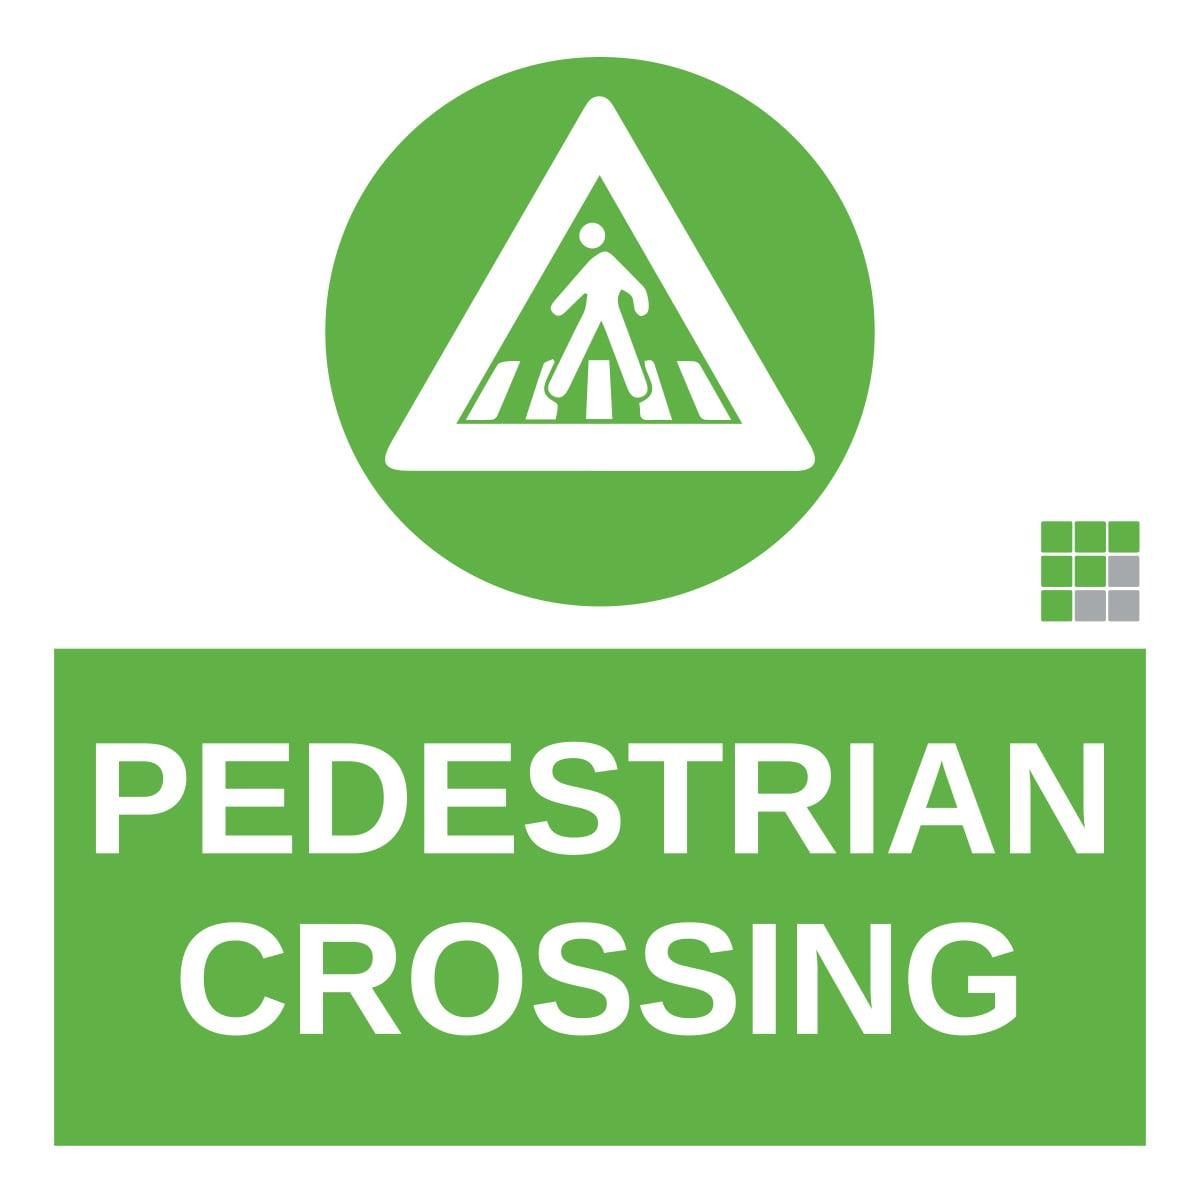 pedestrian crossing - 1x1ft.jpg